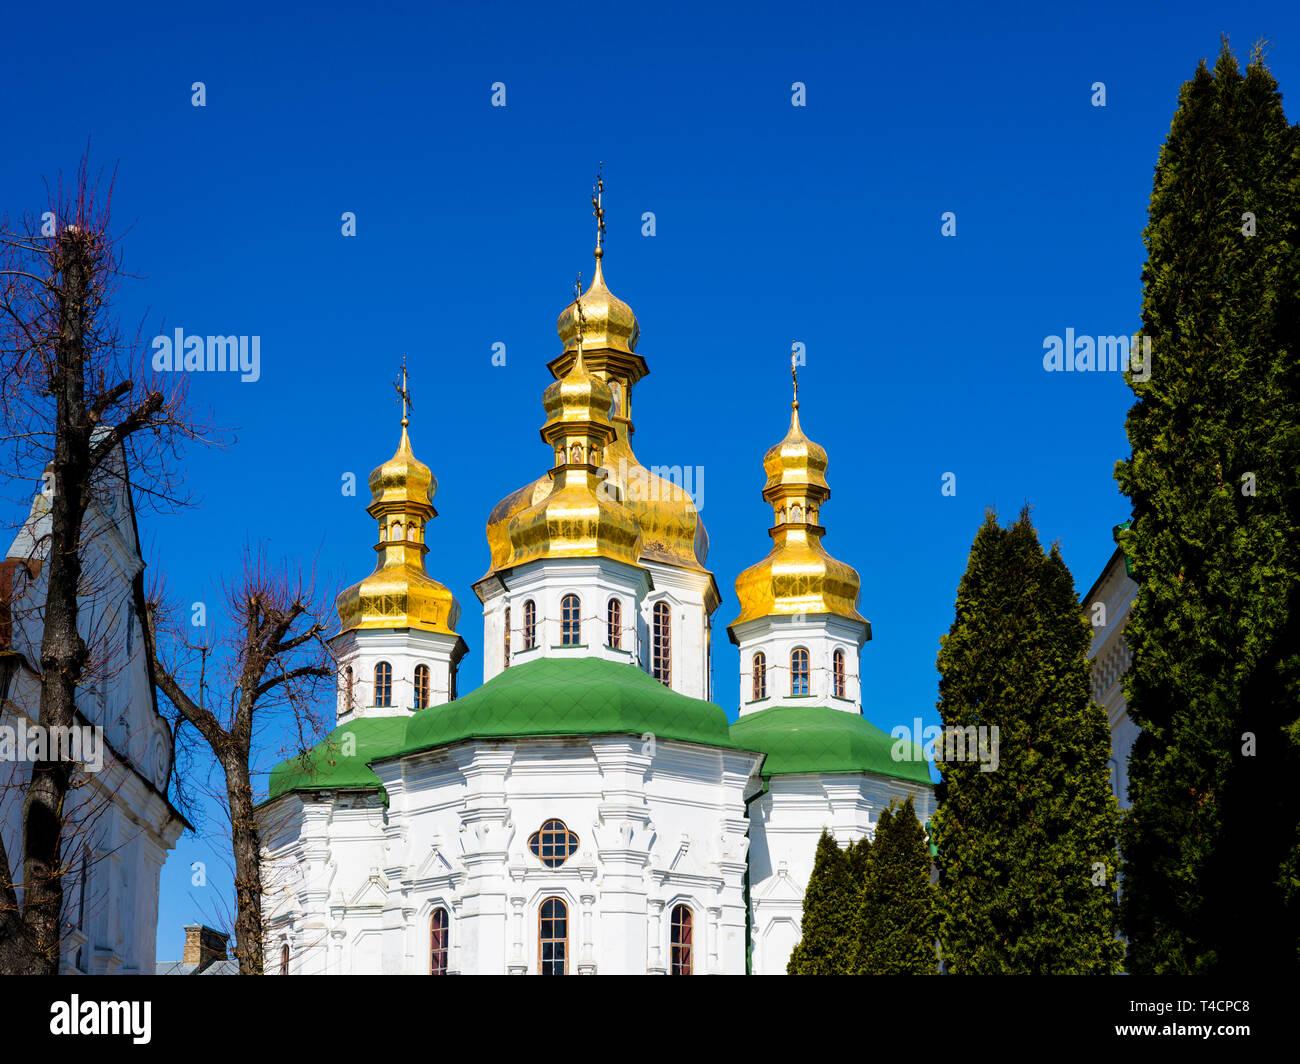 Kiev Pechersk Lavra (Cave Monastery), Kiev, Ukraine: Church of All Saints - Stock Image